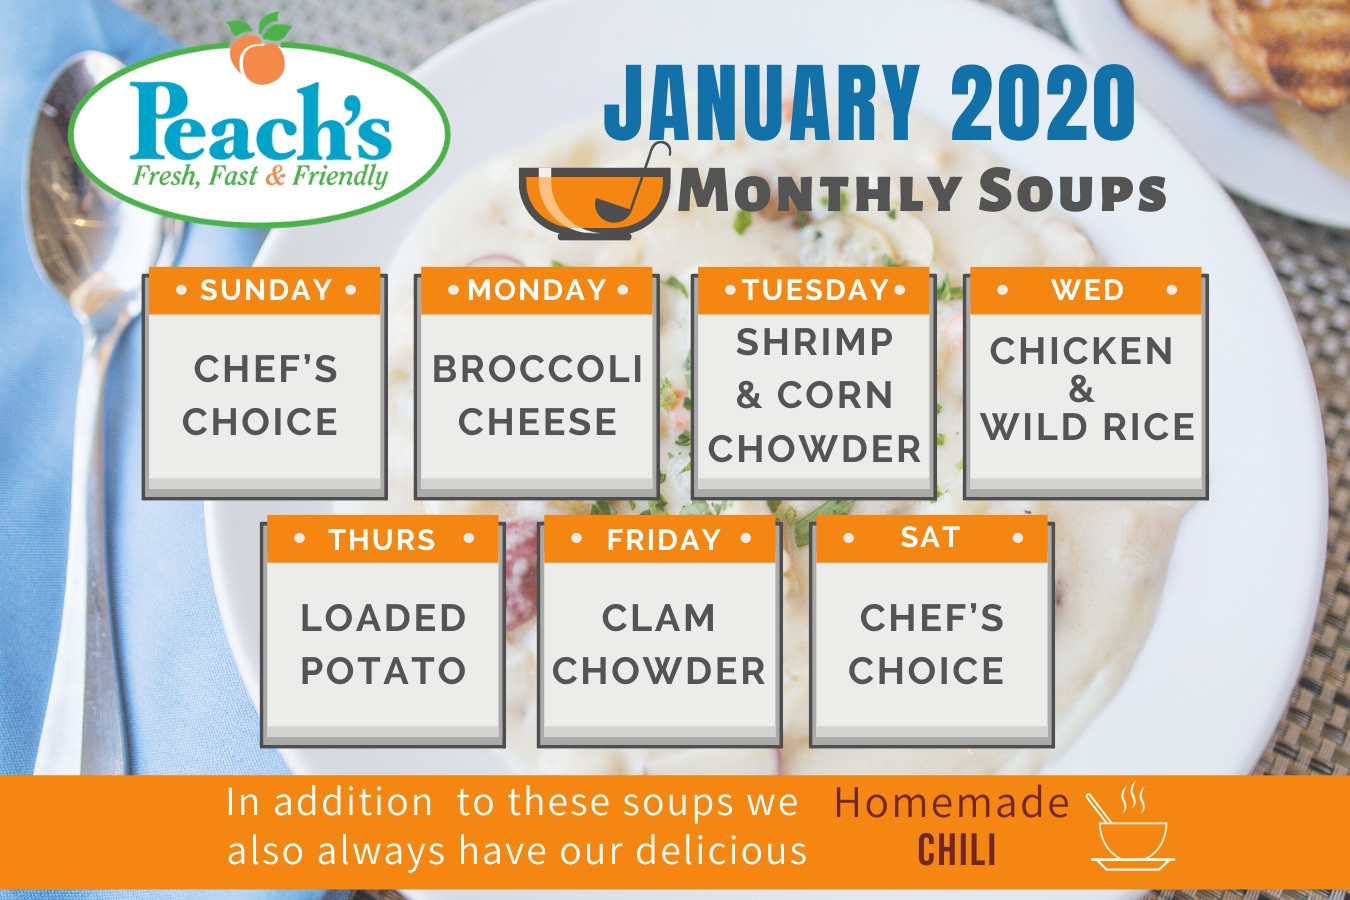 jan_monthly_soups.jpg